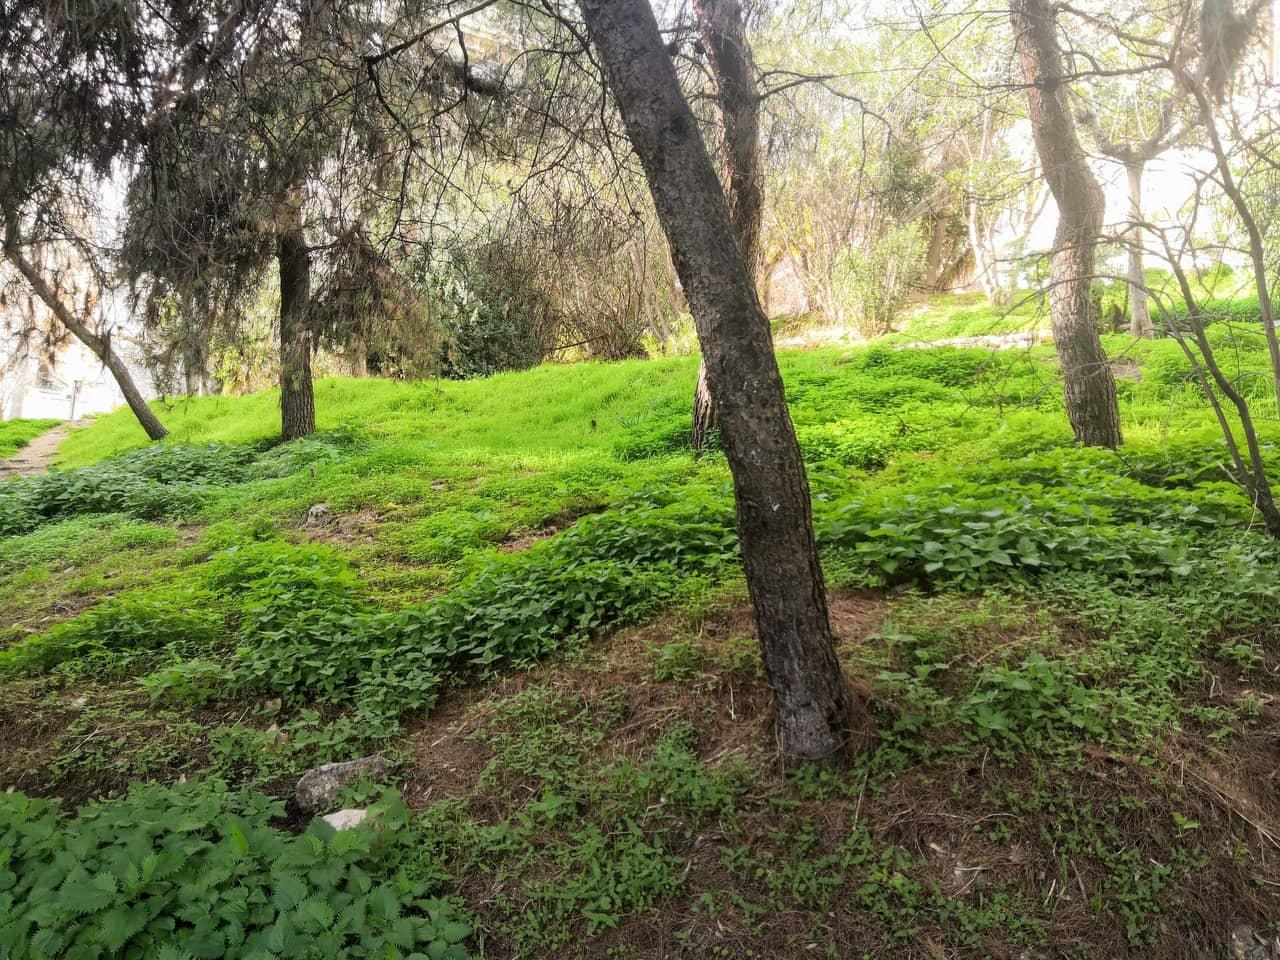 Inside a forest on a hillside